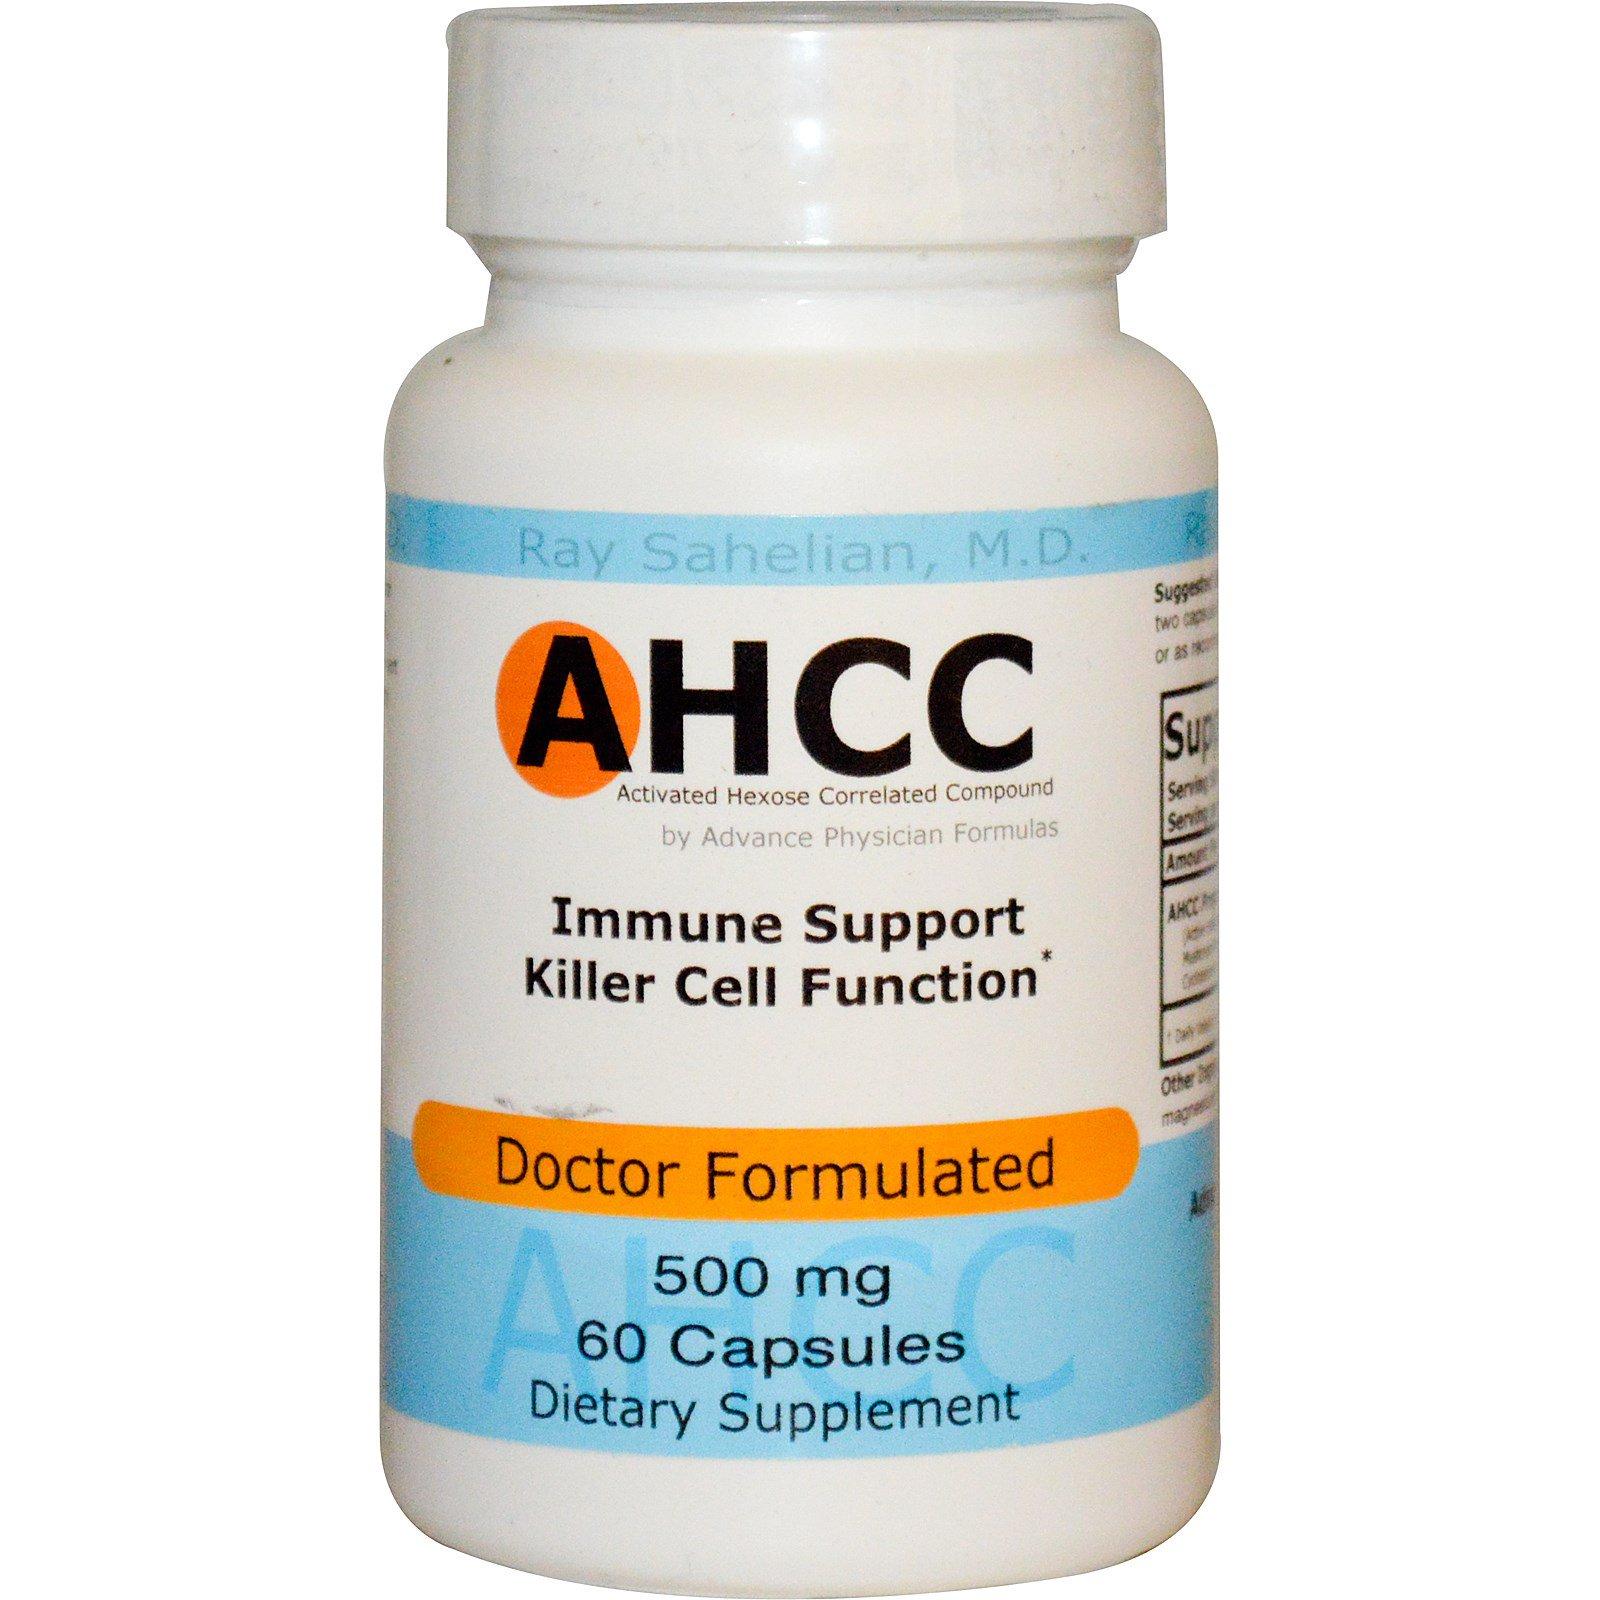 Advance Physician Formulas, Inc , AHCC (Activated Hexose